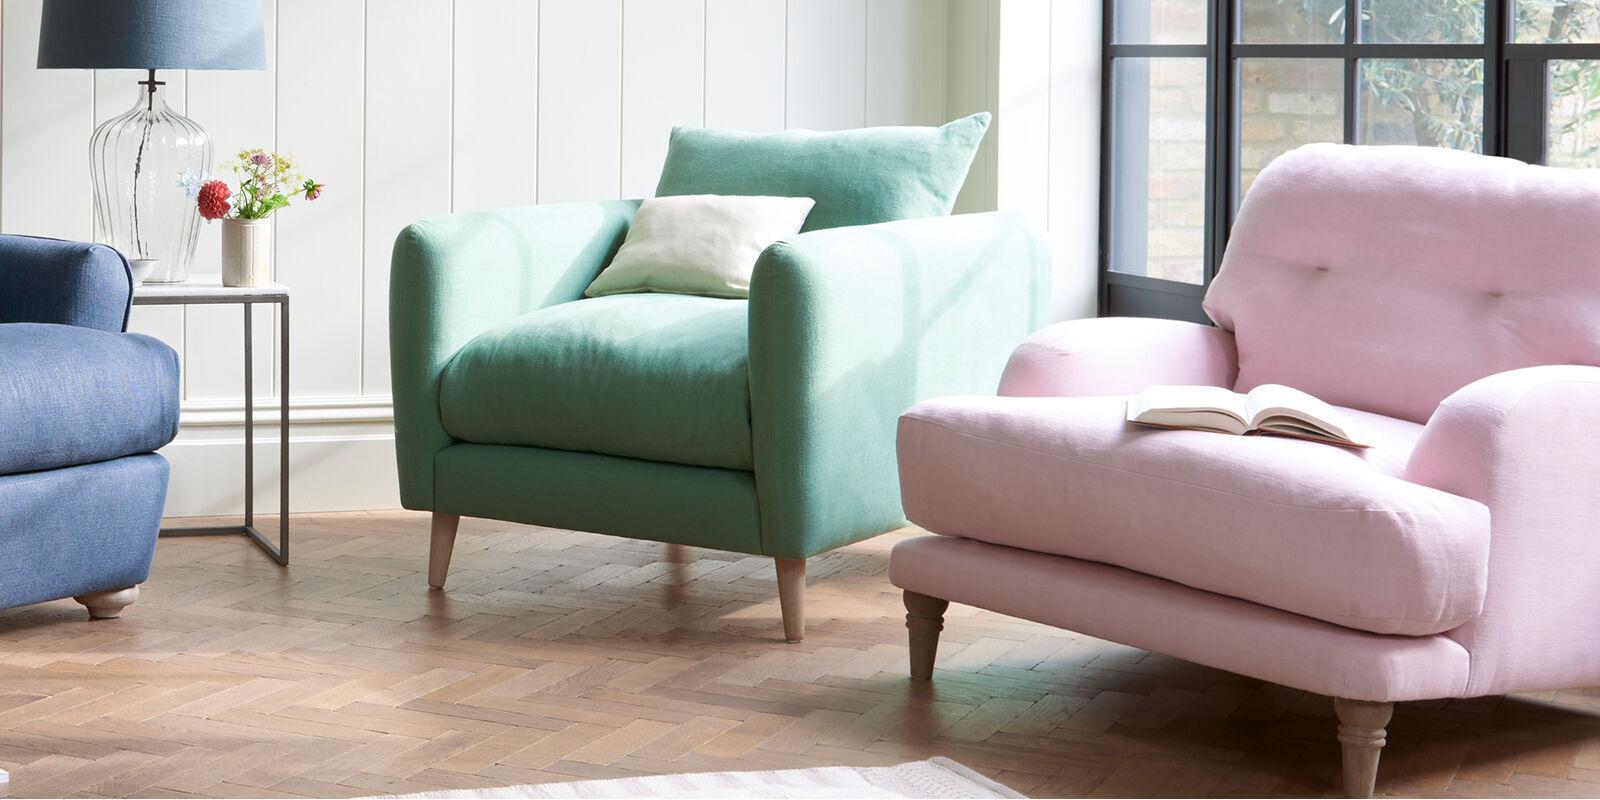 armchair range6226 banner